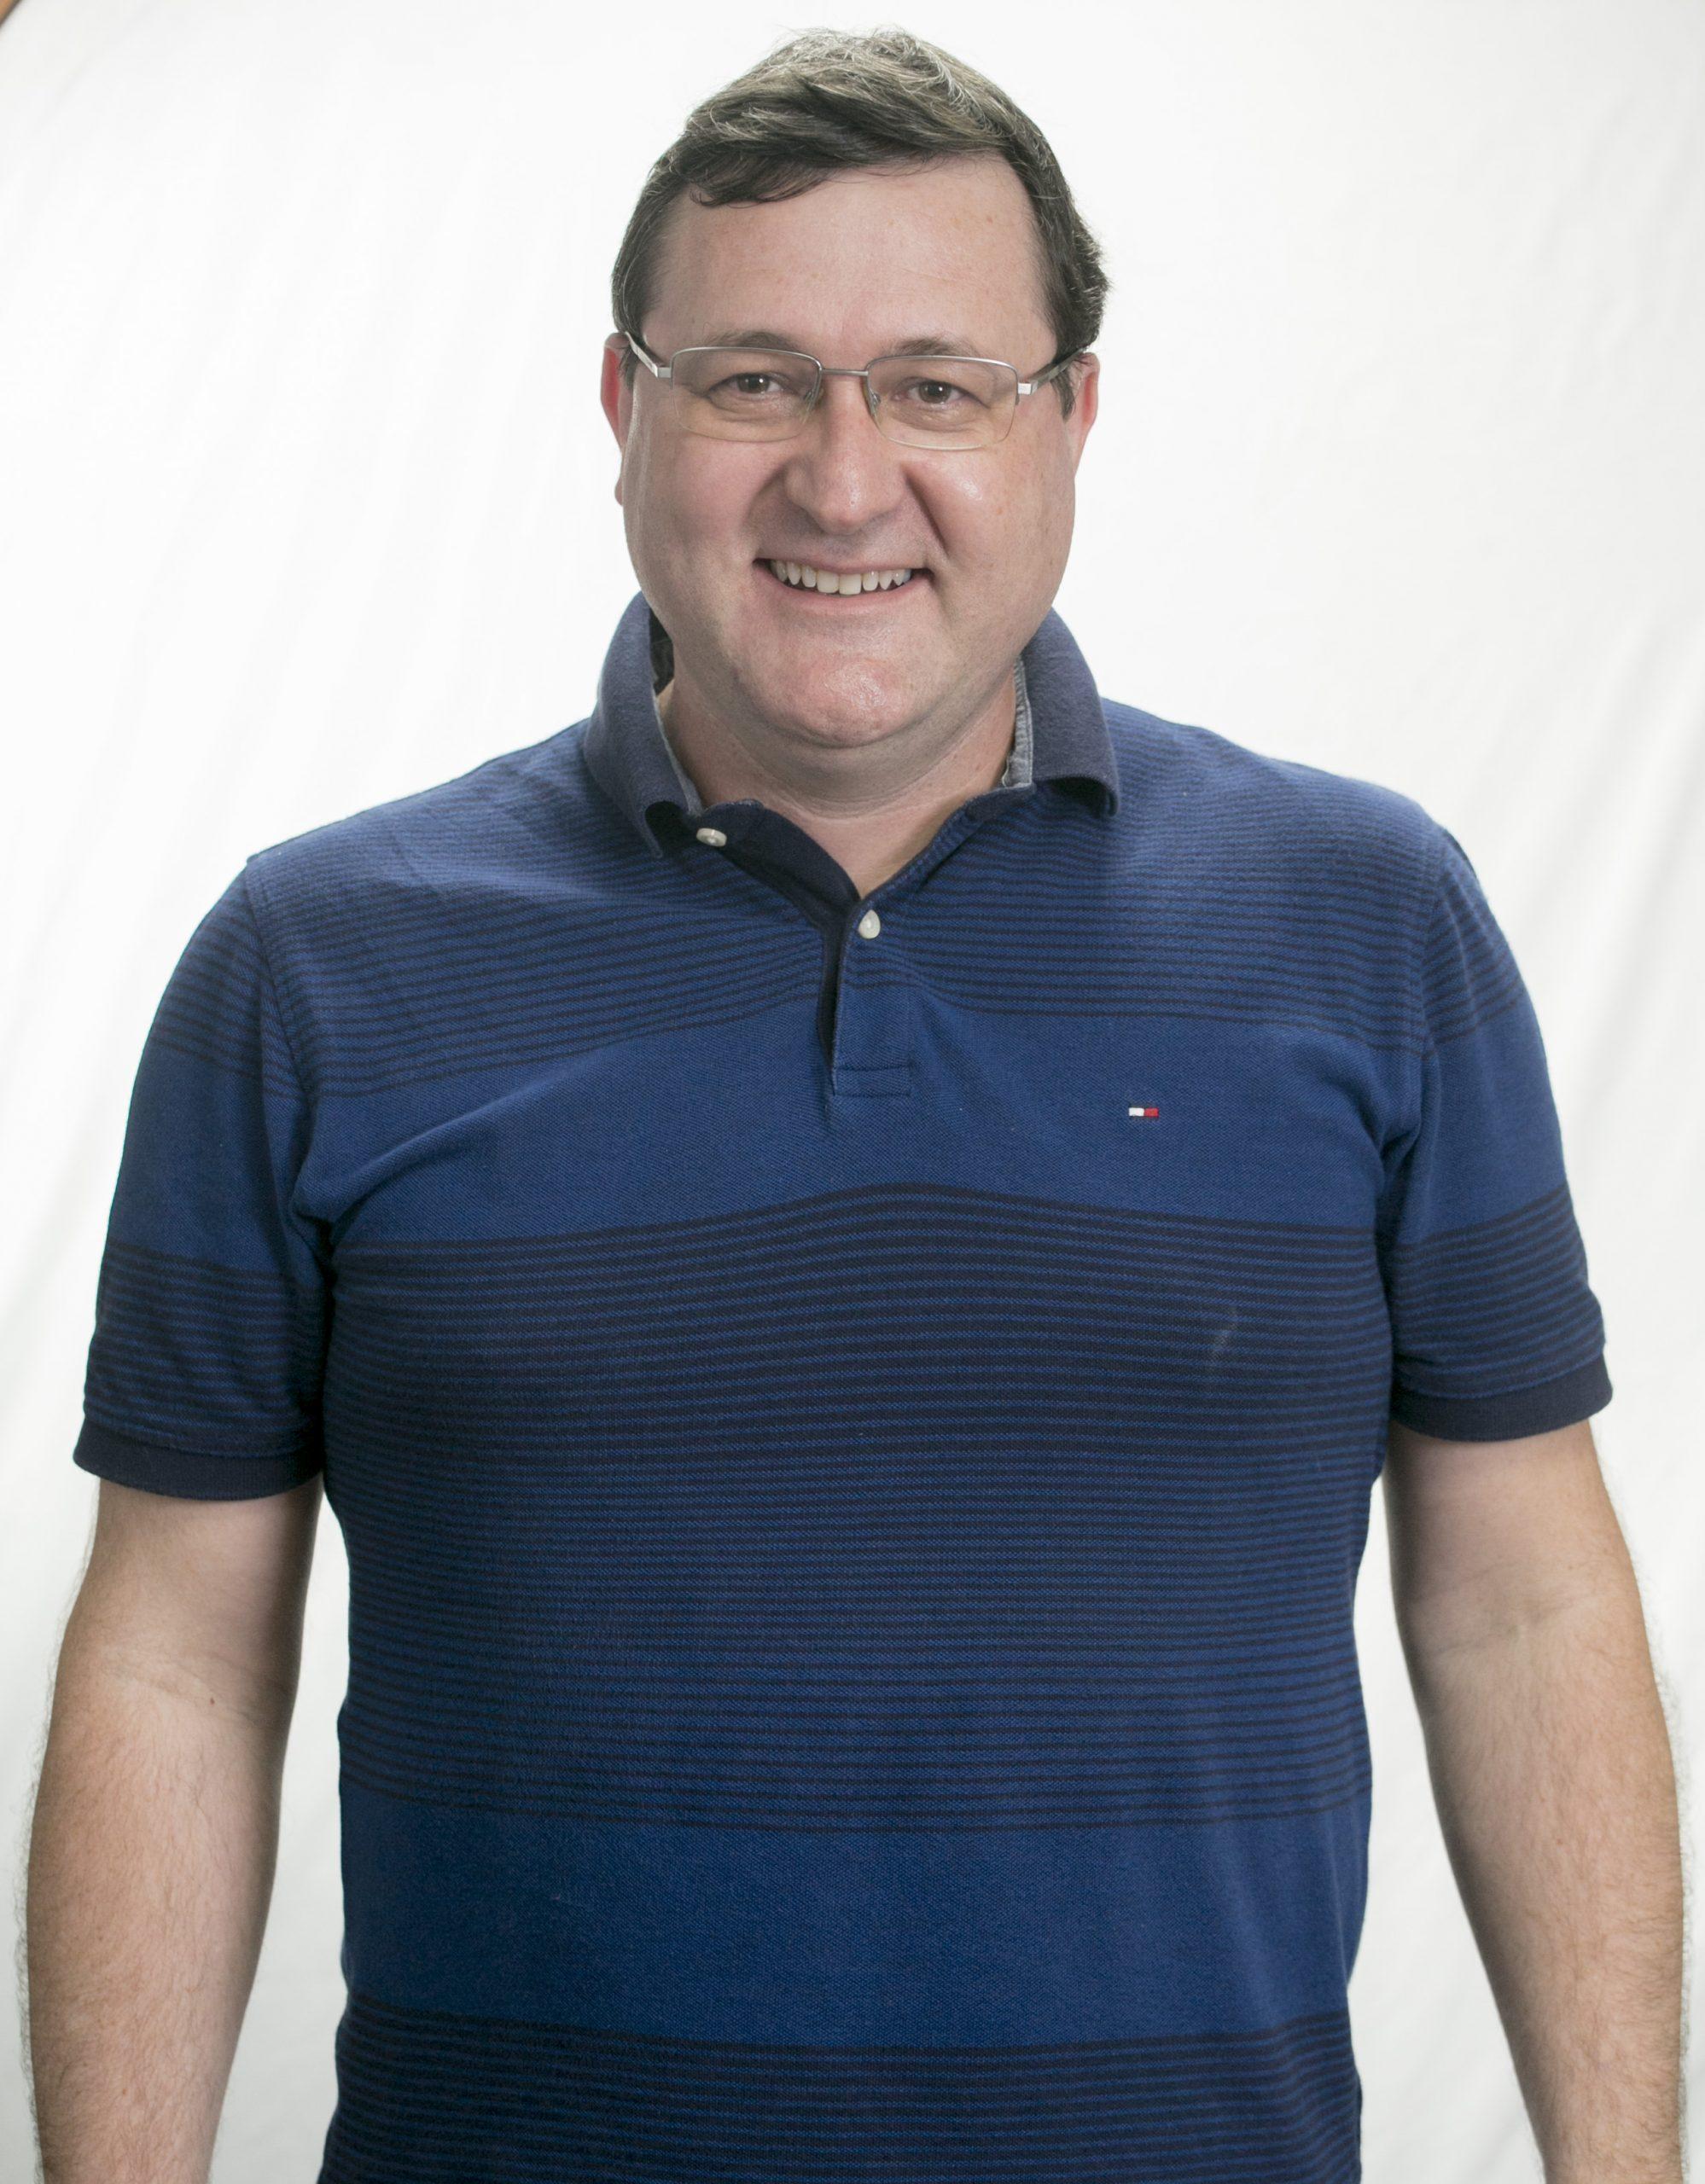 Líder do time Àgil da Obejctive Marcelo Walter